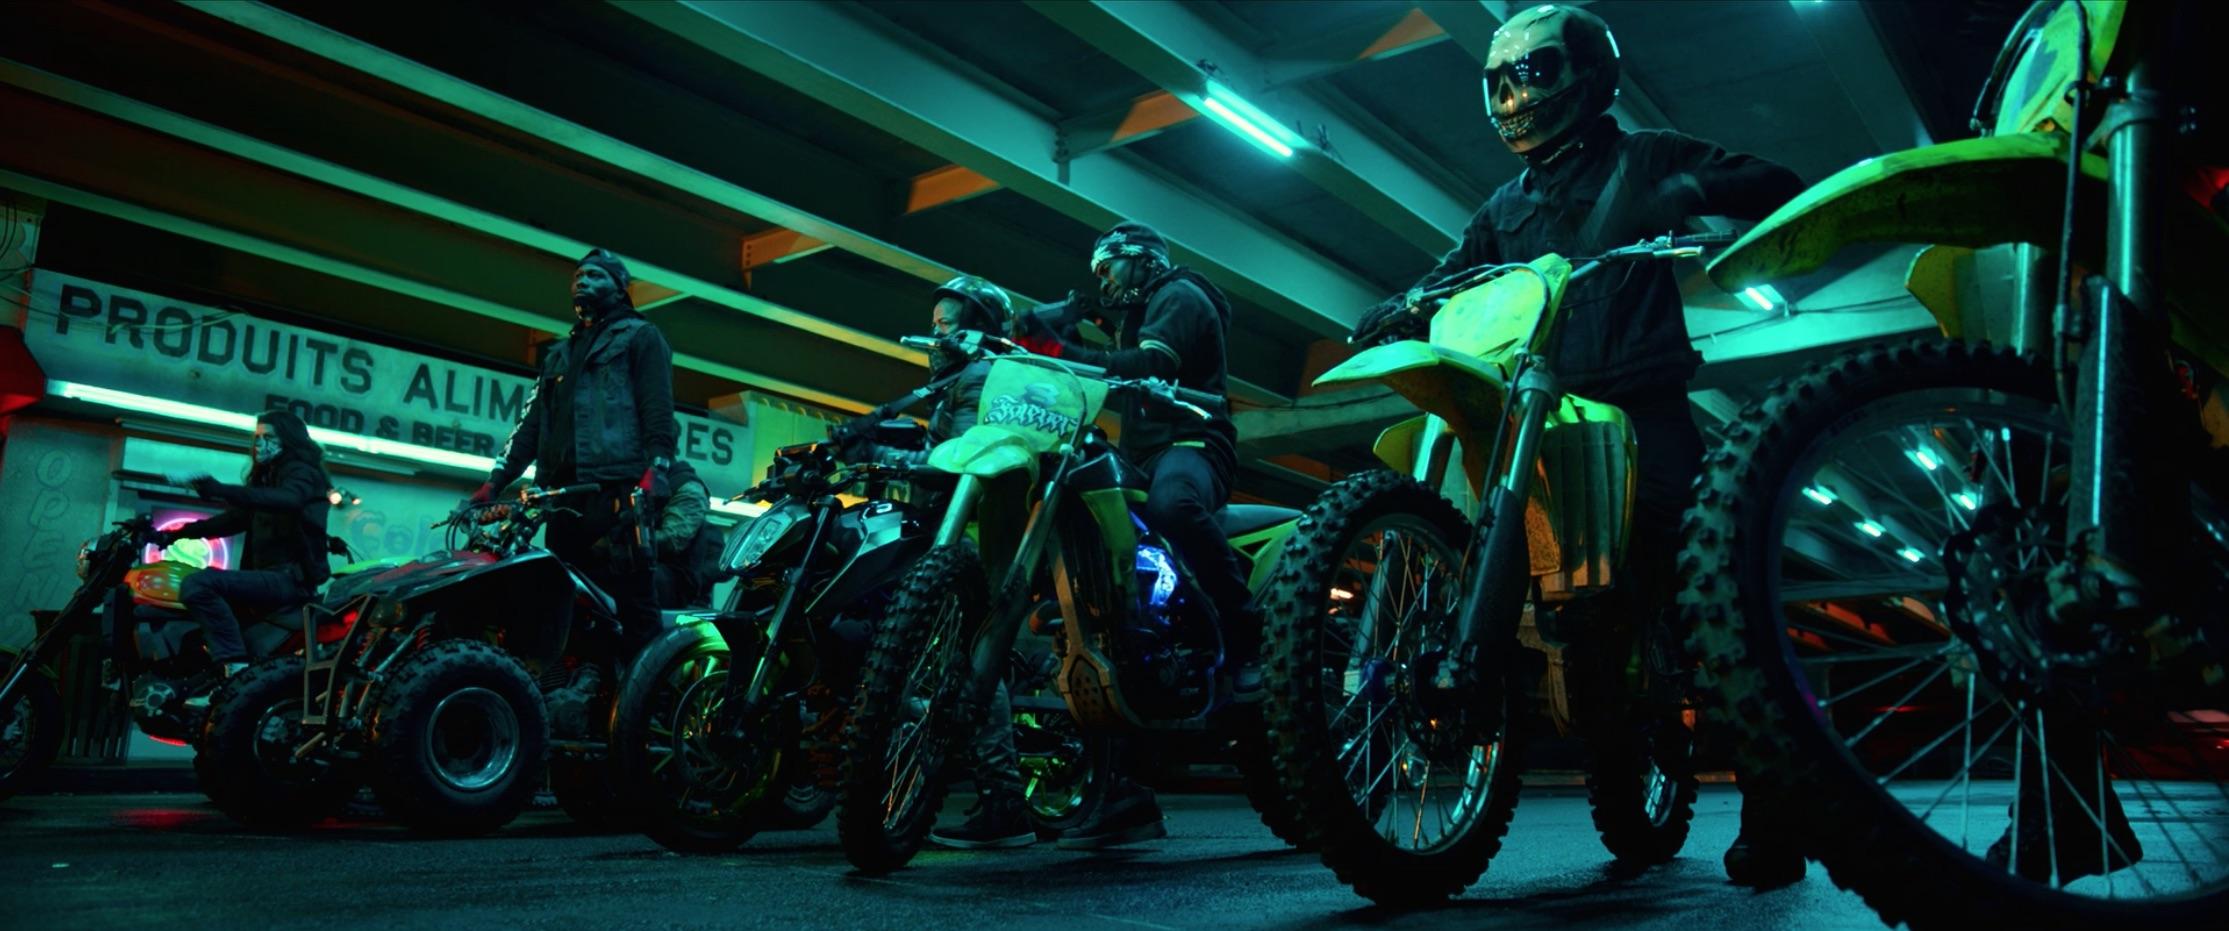 Bad Boys For Life urban motocross rider gang